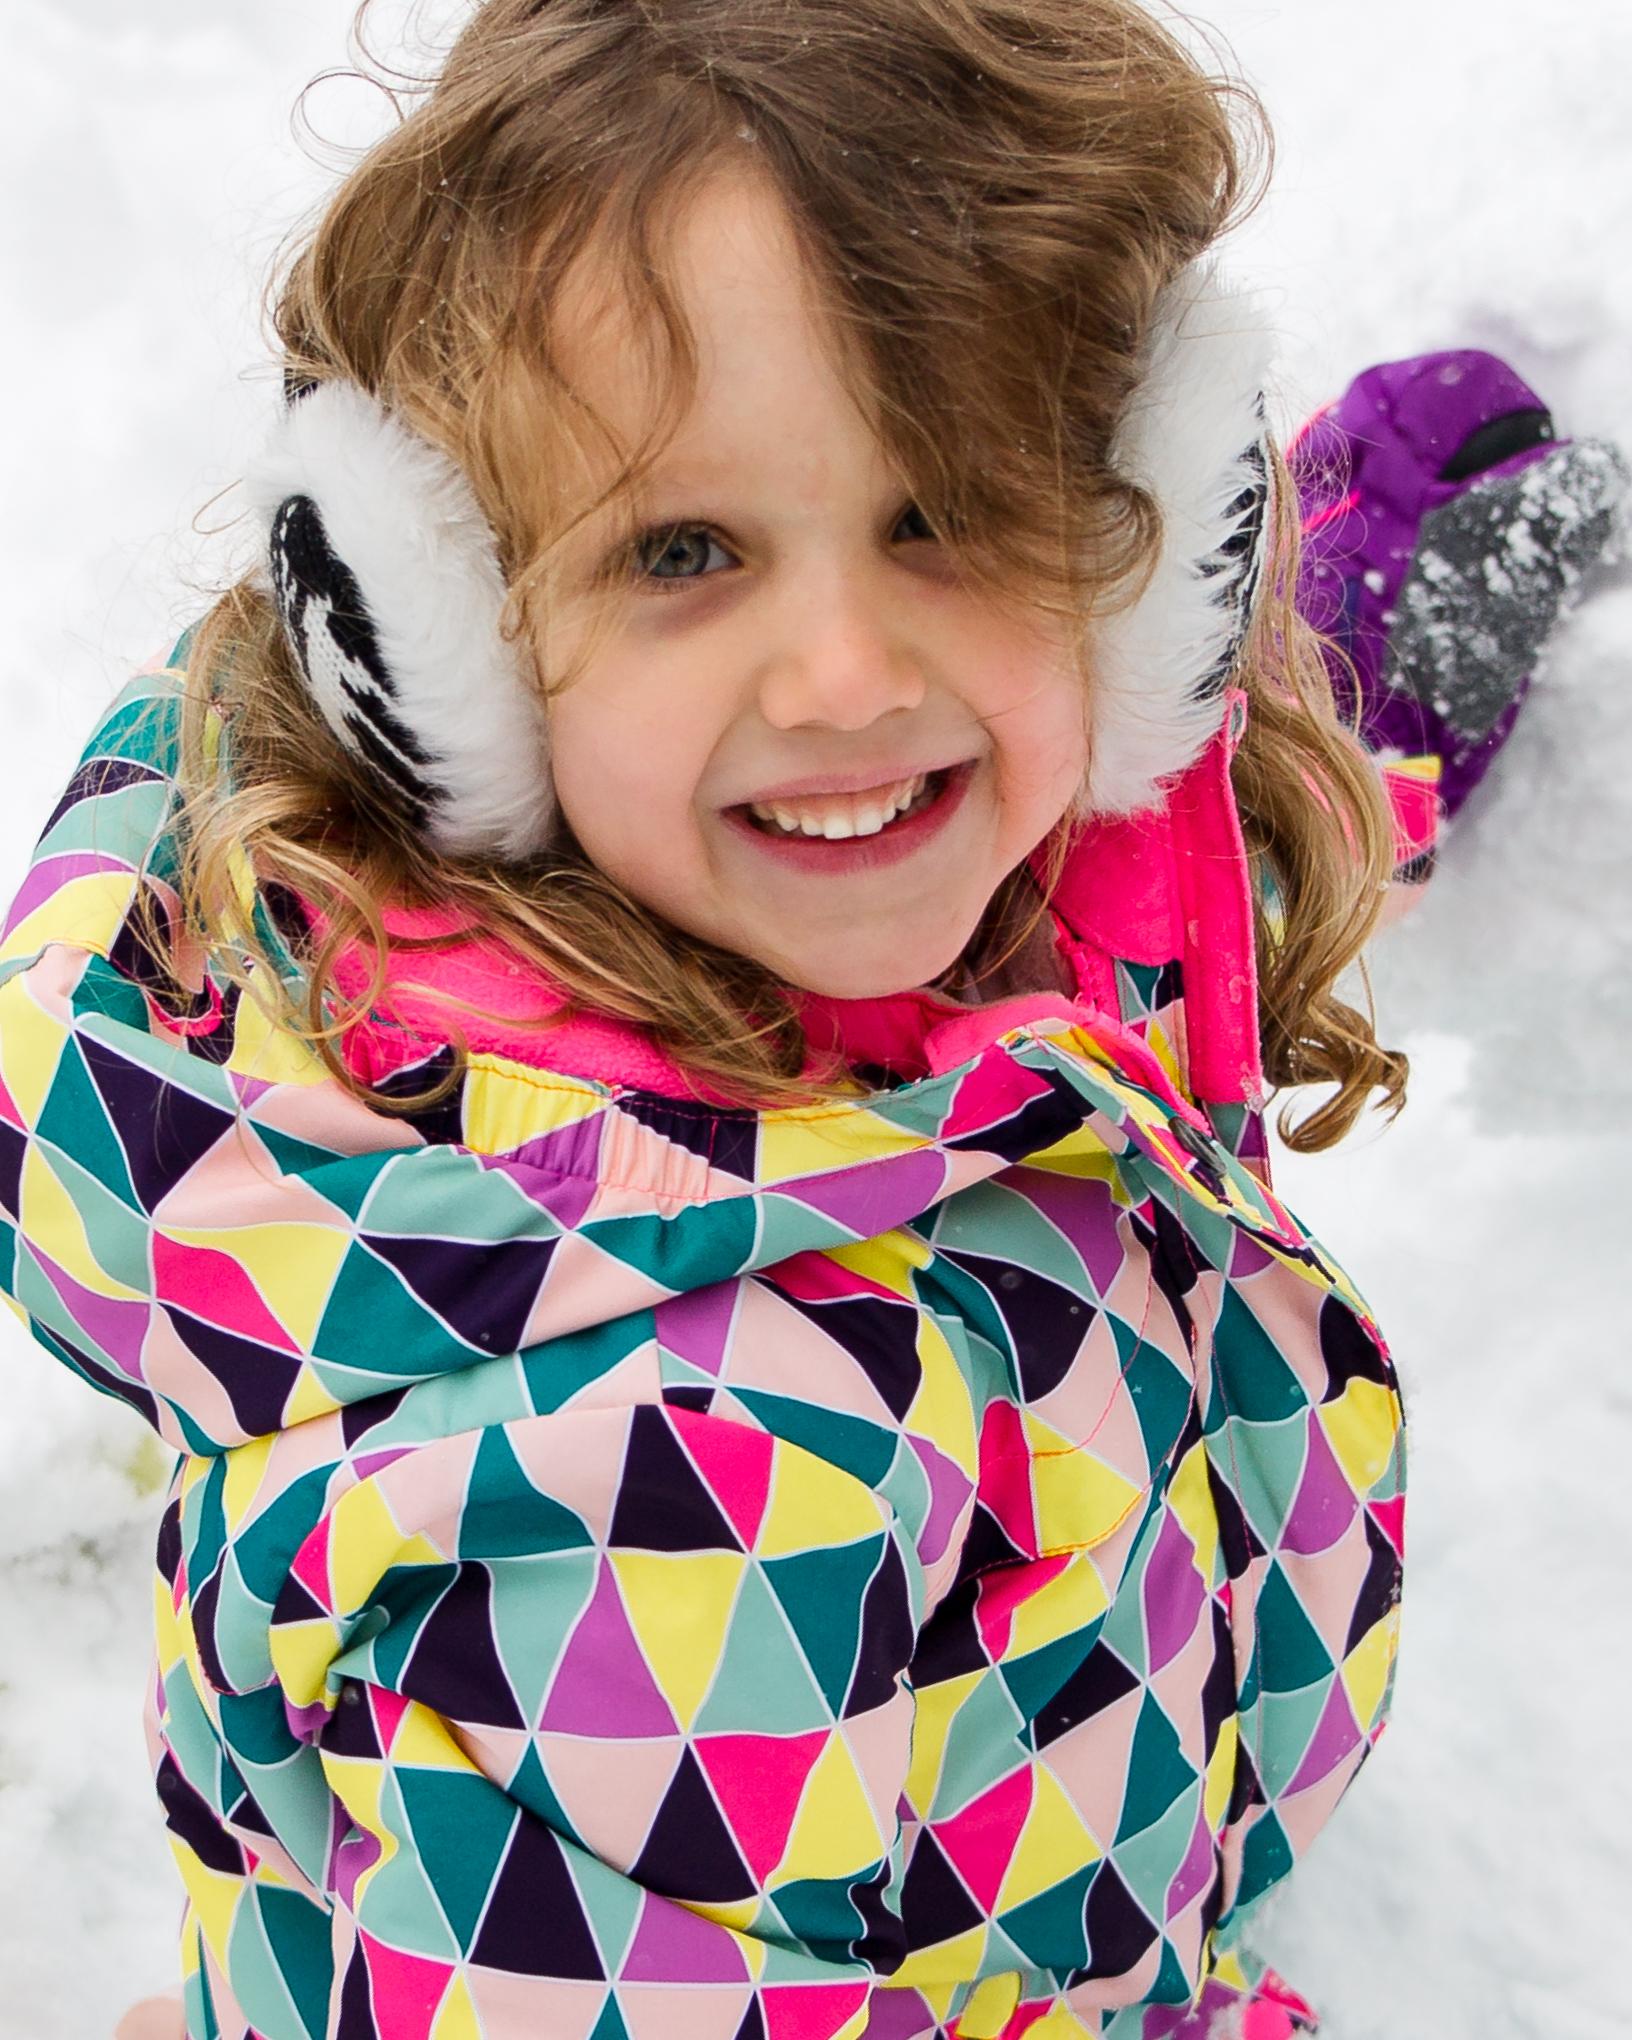 snow2020-2402